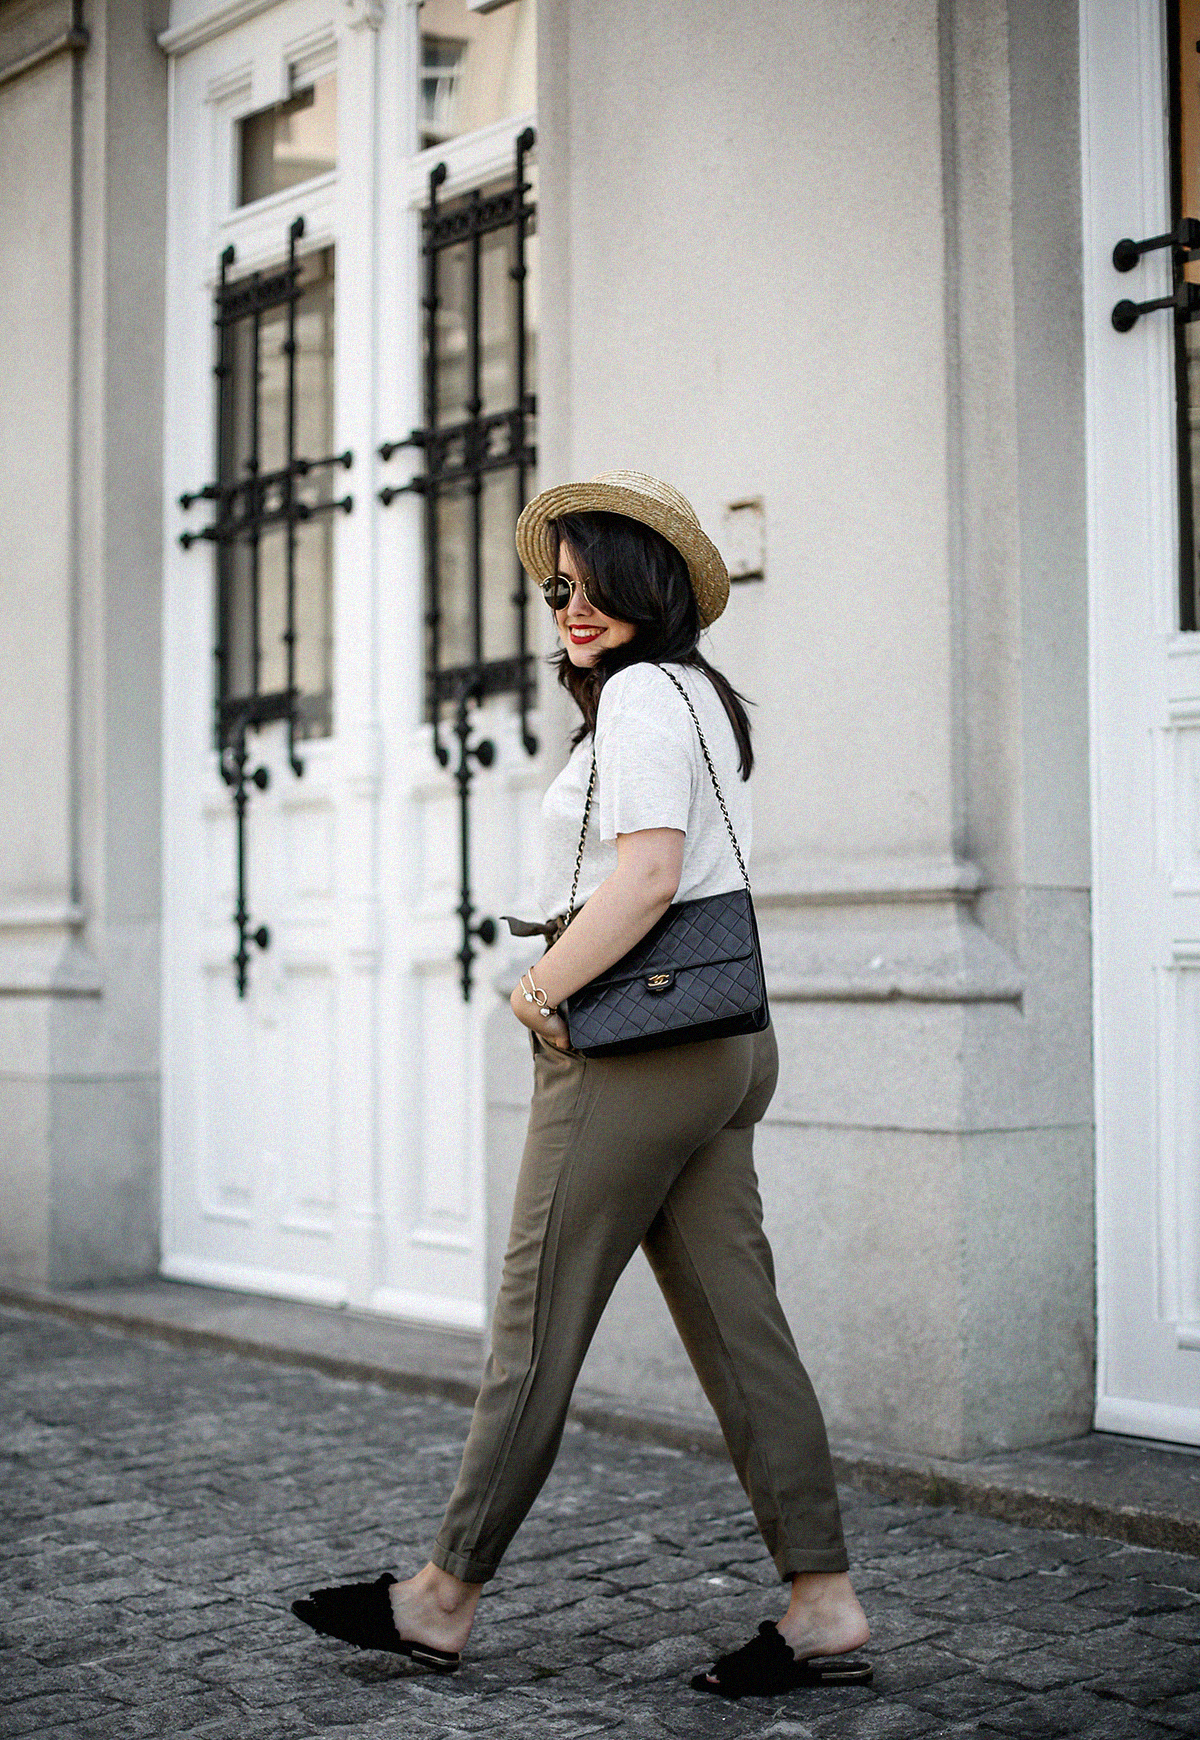 pantalones-verdes-altos-palas-borlas-zara-canotier-look-myblueberrynightsblog10